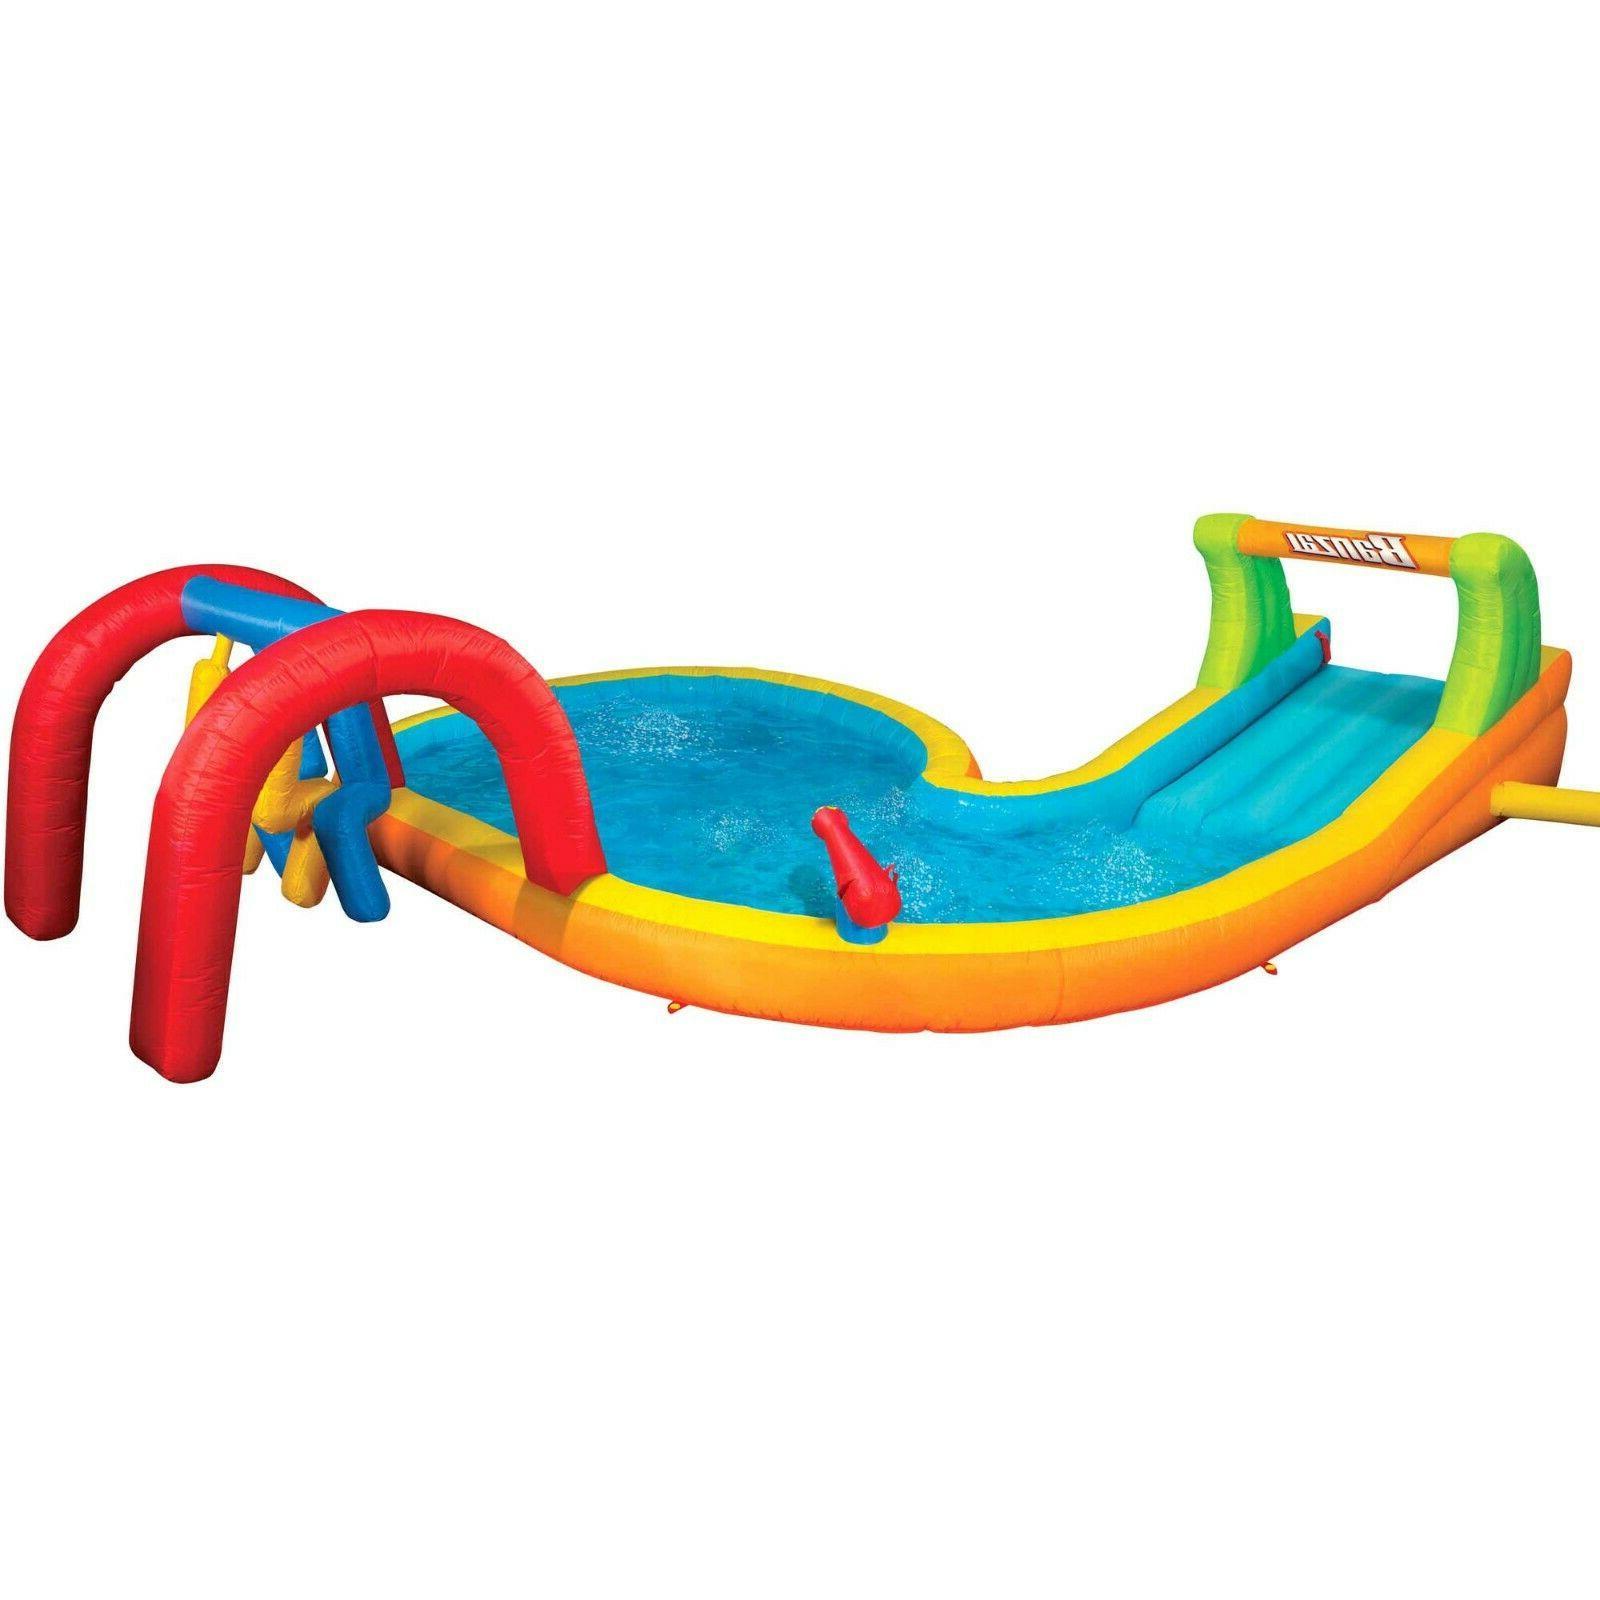 Banzai Water Zone Inflatable Summer Backyard Splash Pool